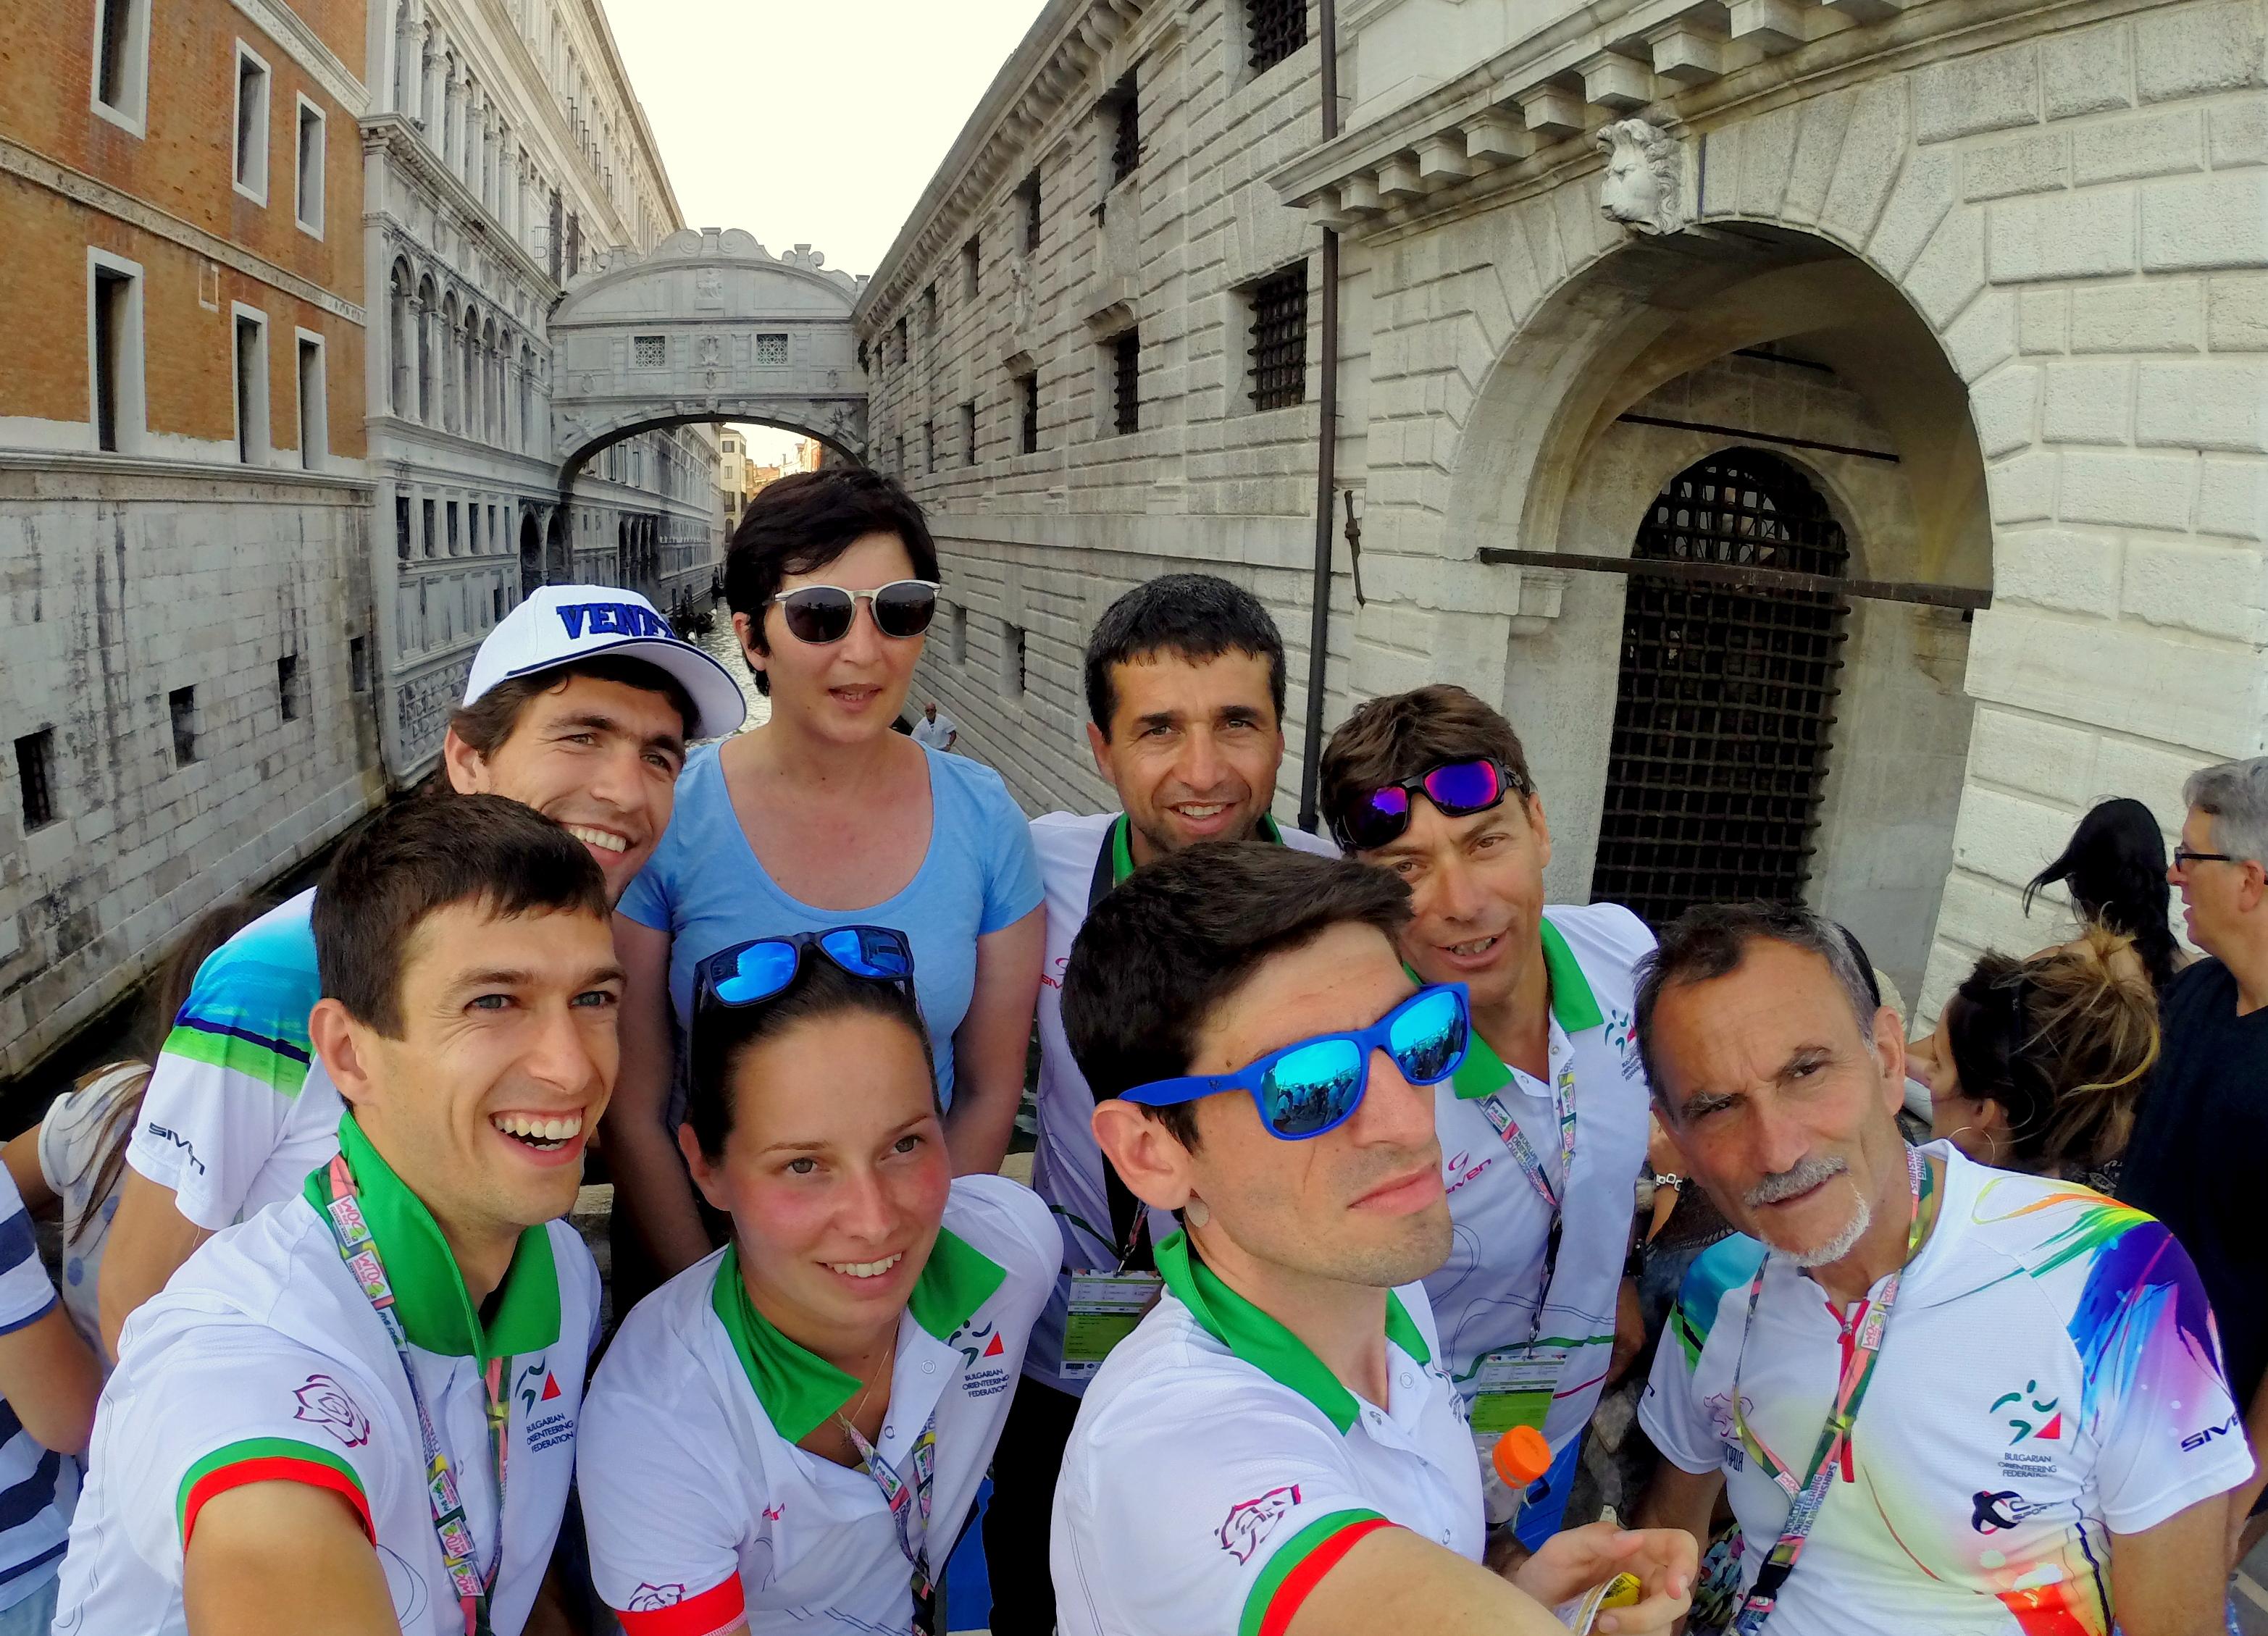 Part of BUL WOC Team at Venice